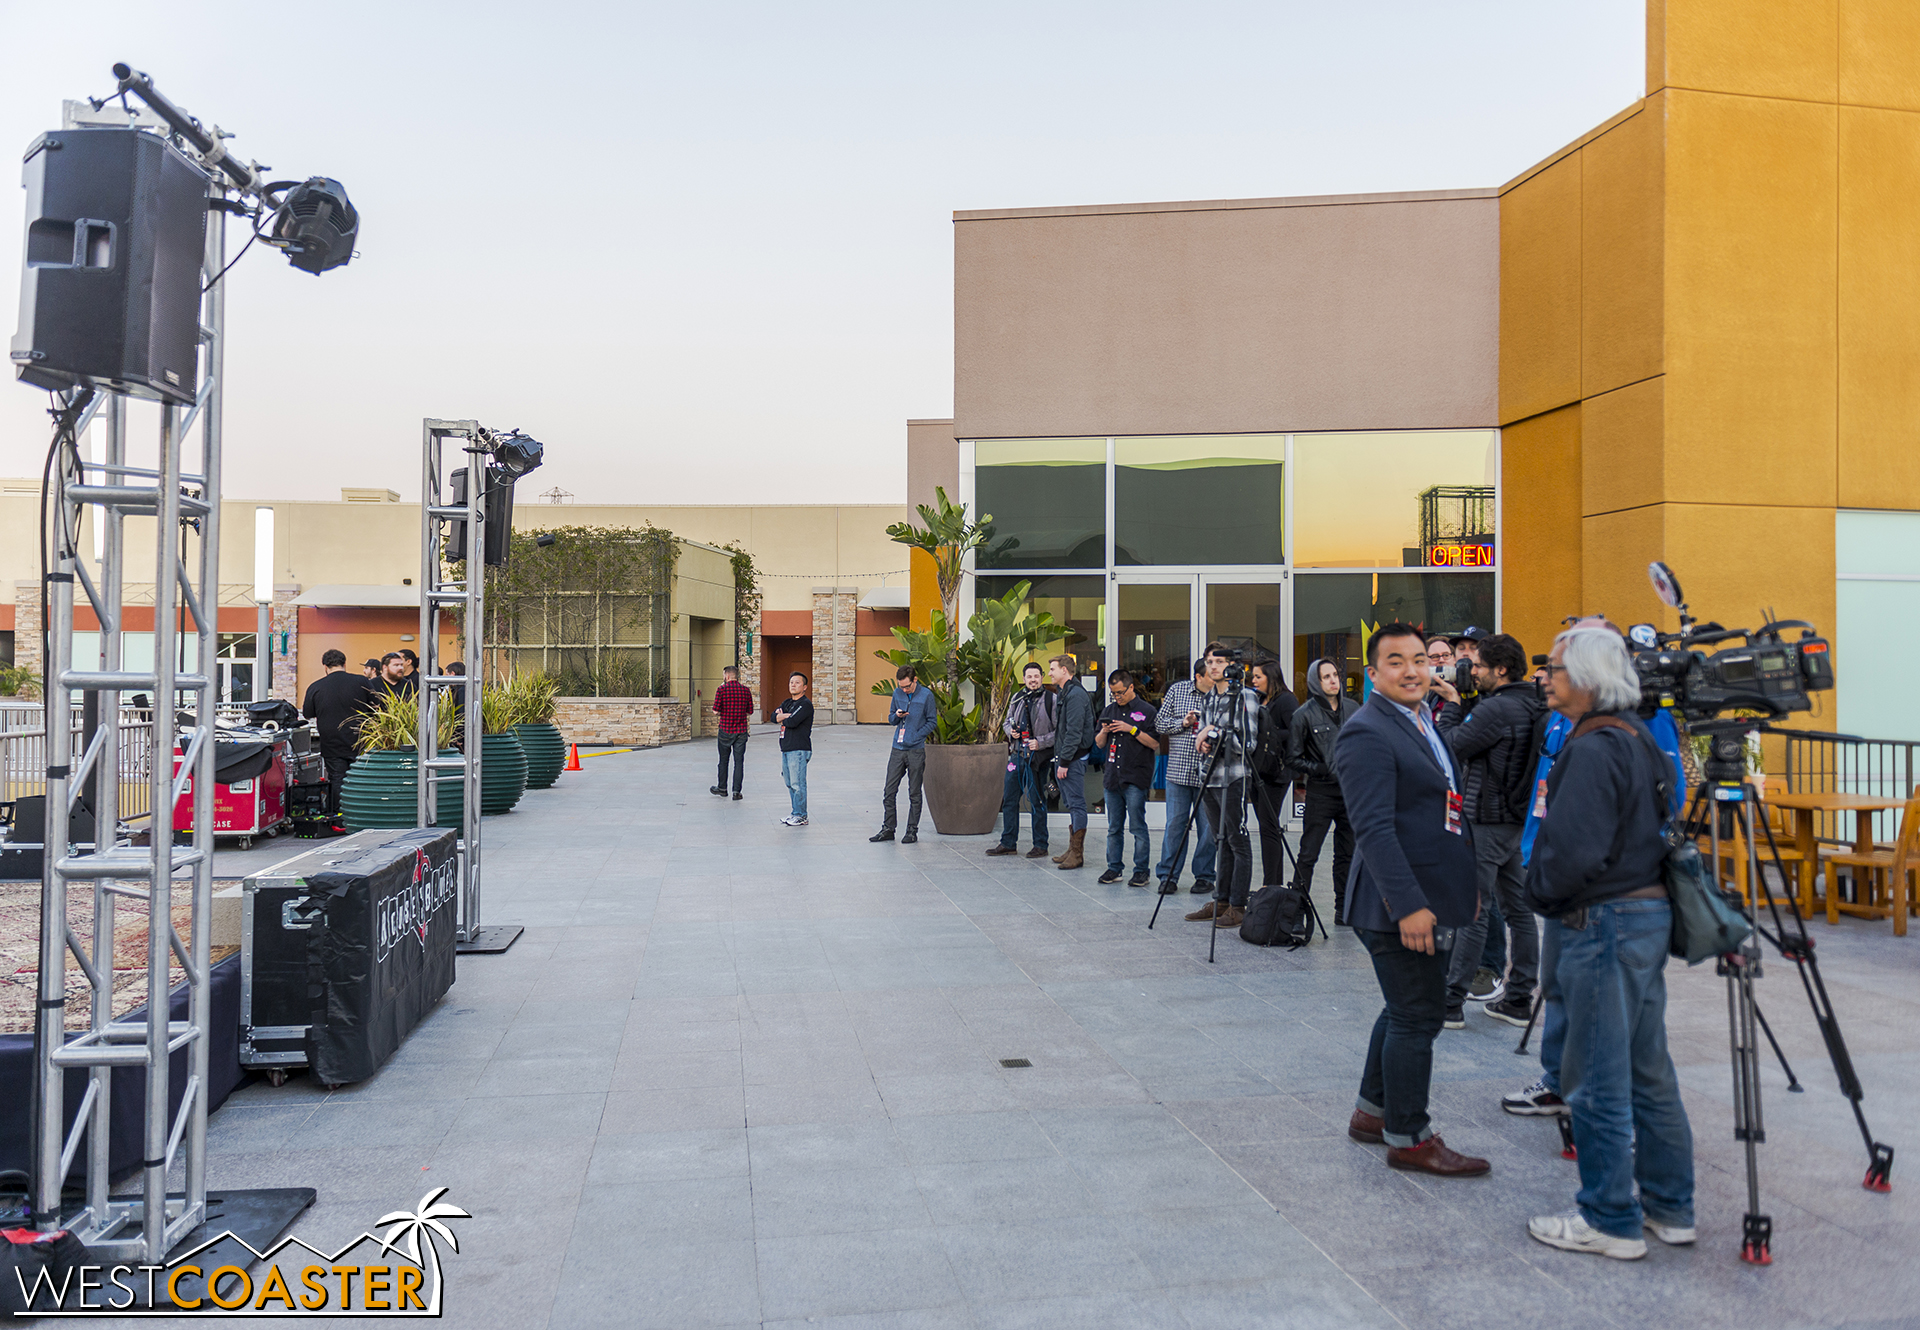 Media members waiting for the grand opening festivities.